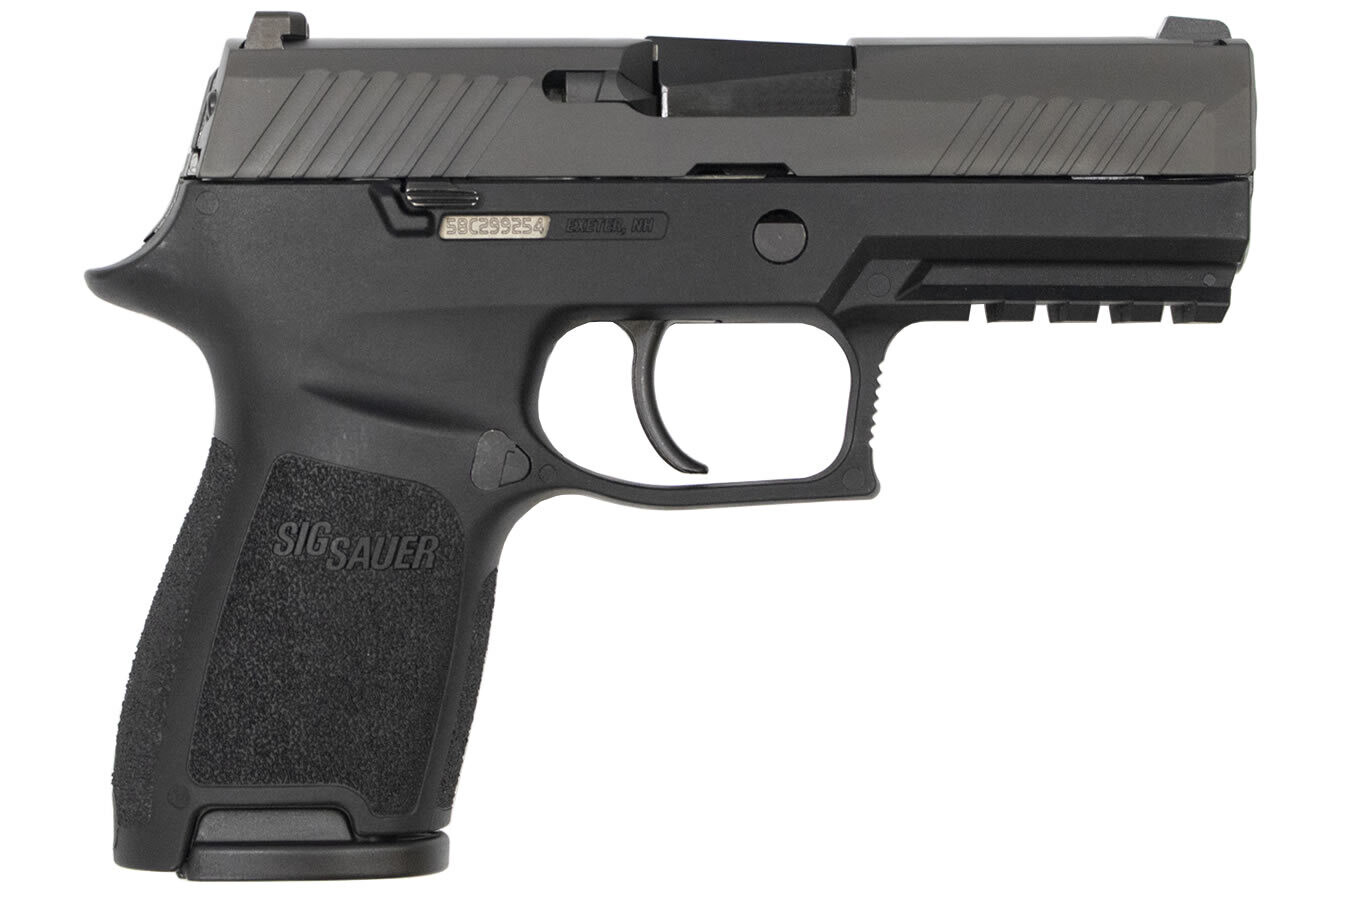 80% Sig Sauer P320 Compact 40 S&W Centerfire Pistol Comes With Pistol Case